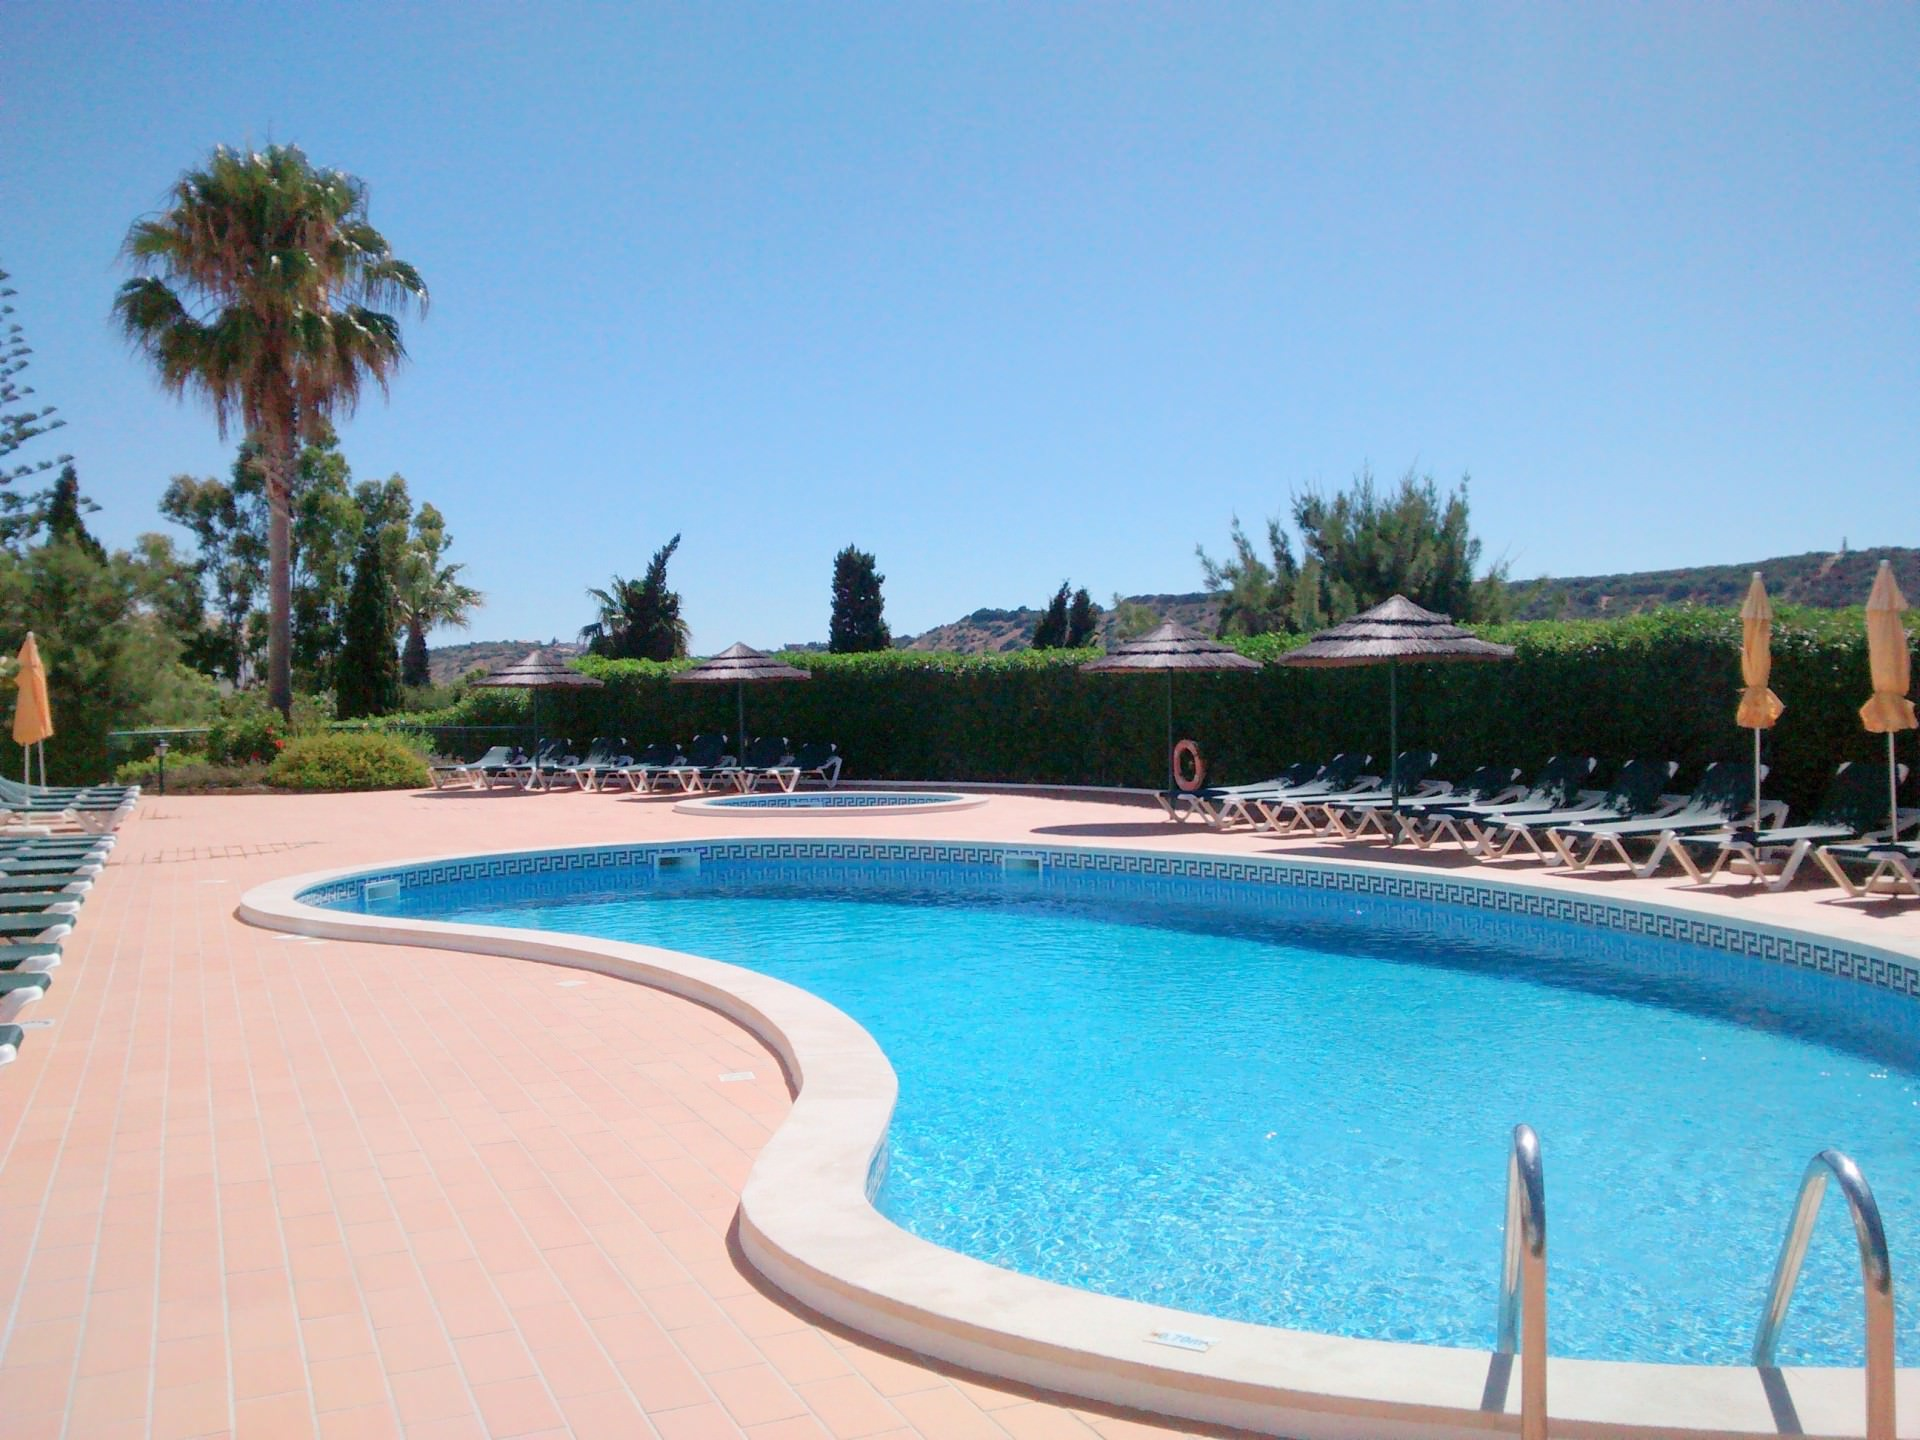 Cristaluz-Pool